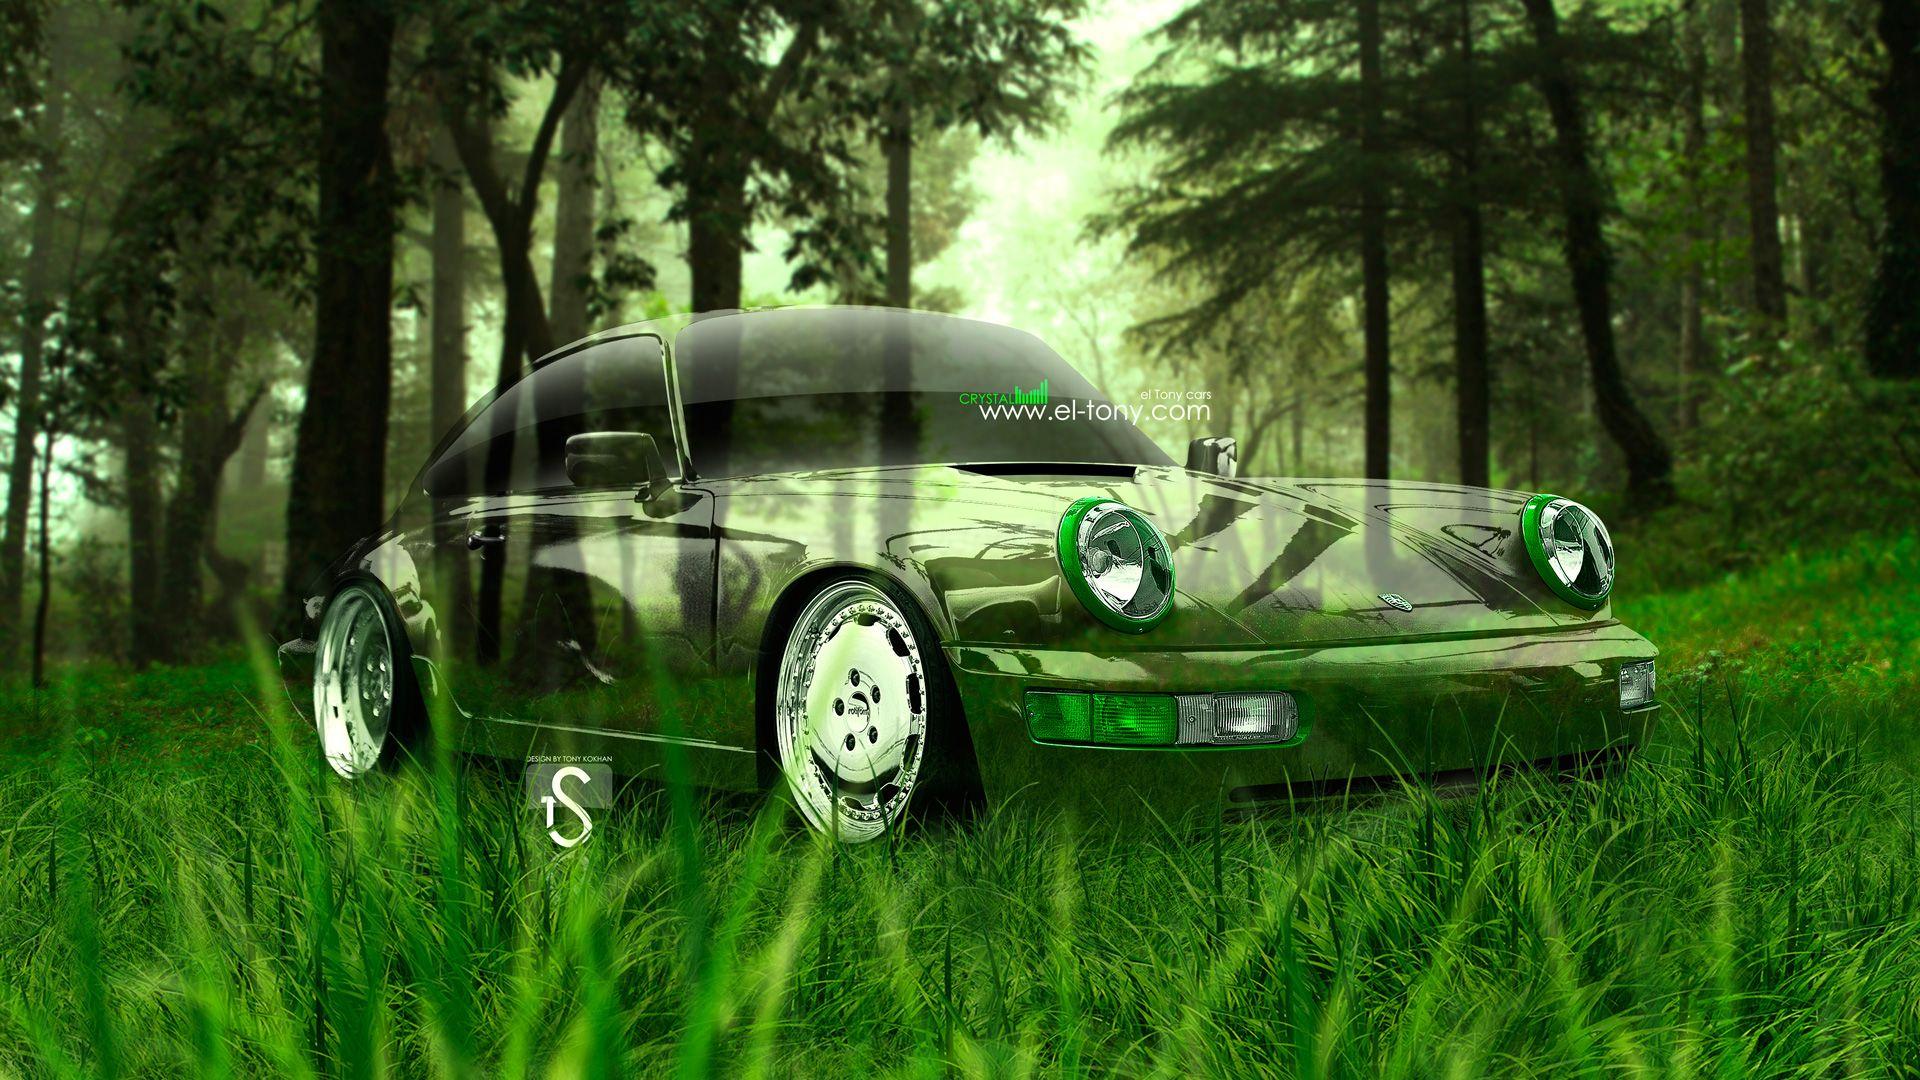 Nice Mazda RX 7 JDM Tuning 3D Crystal Nature Car 2015 Green Grass Style 4K Wallpapers Design By Tony Kokhan Www.el Tony.com Image    El Tony.com   Pinterest   Jdm ...